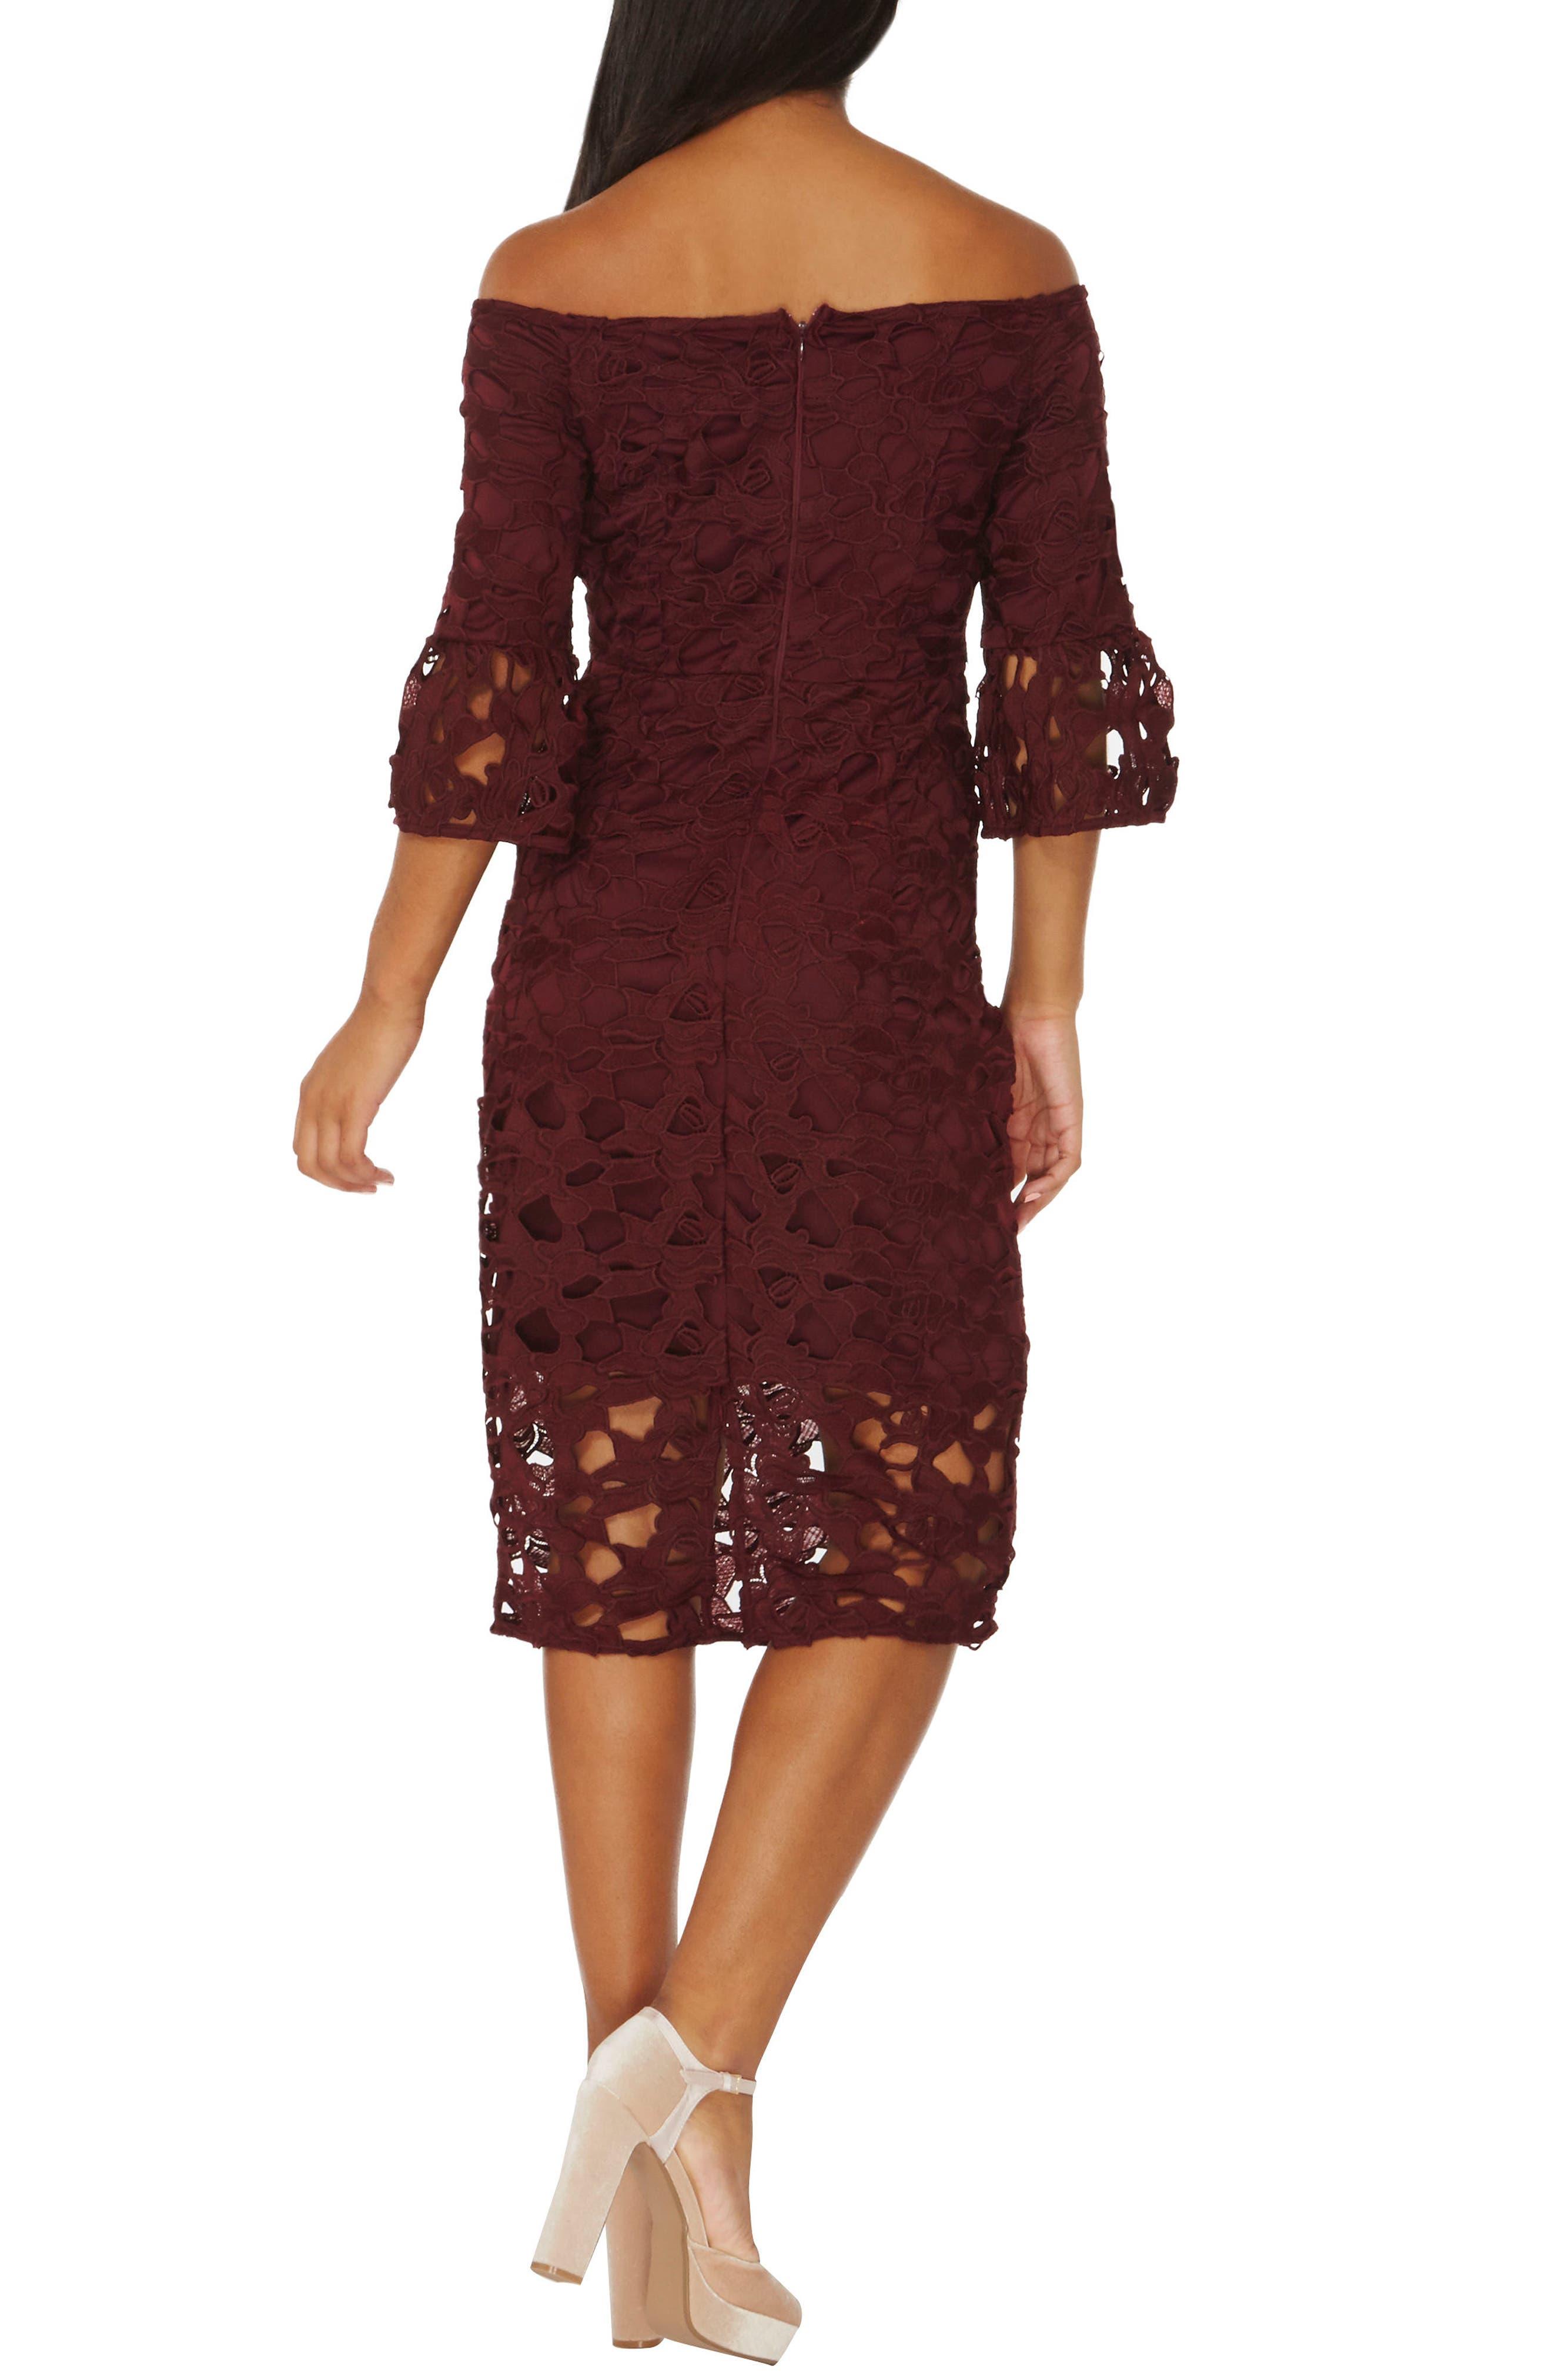 Lace Off the Shoulder Dress,                             Alternate thumbnail 2, color,                             931